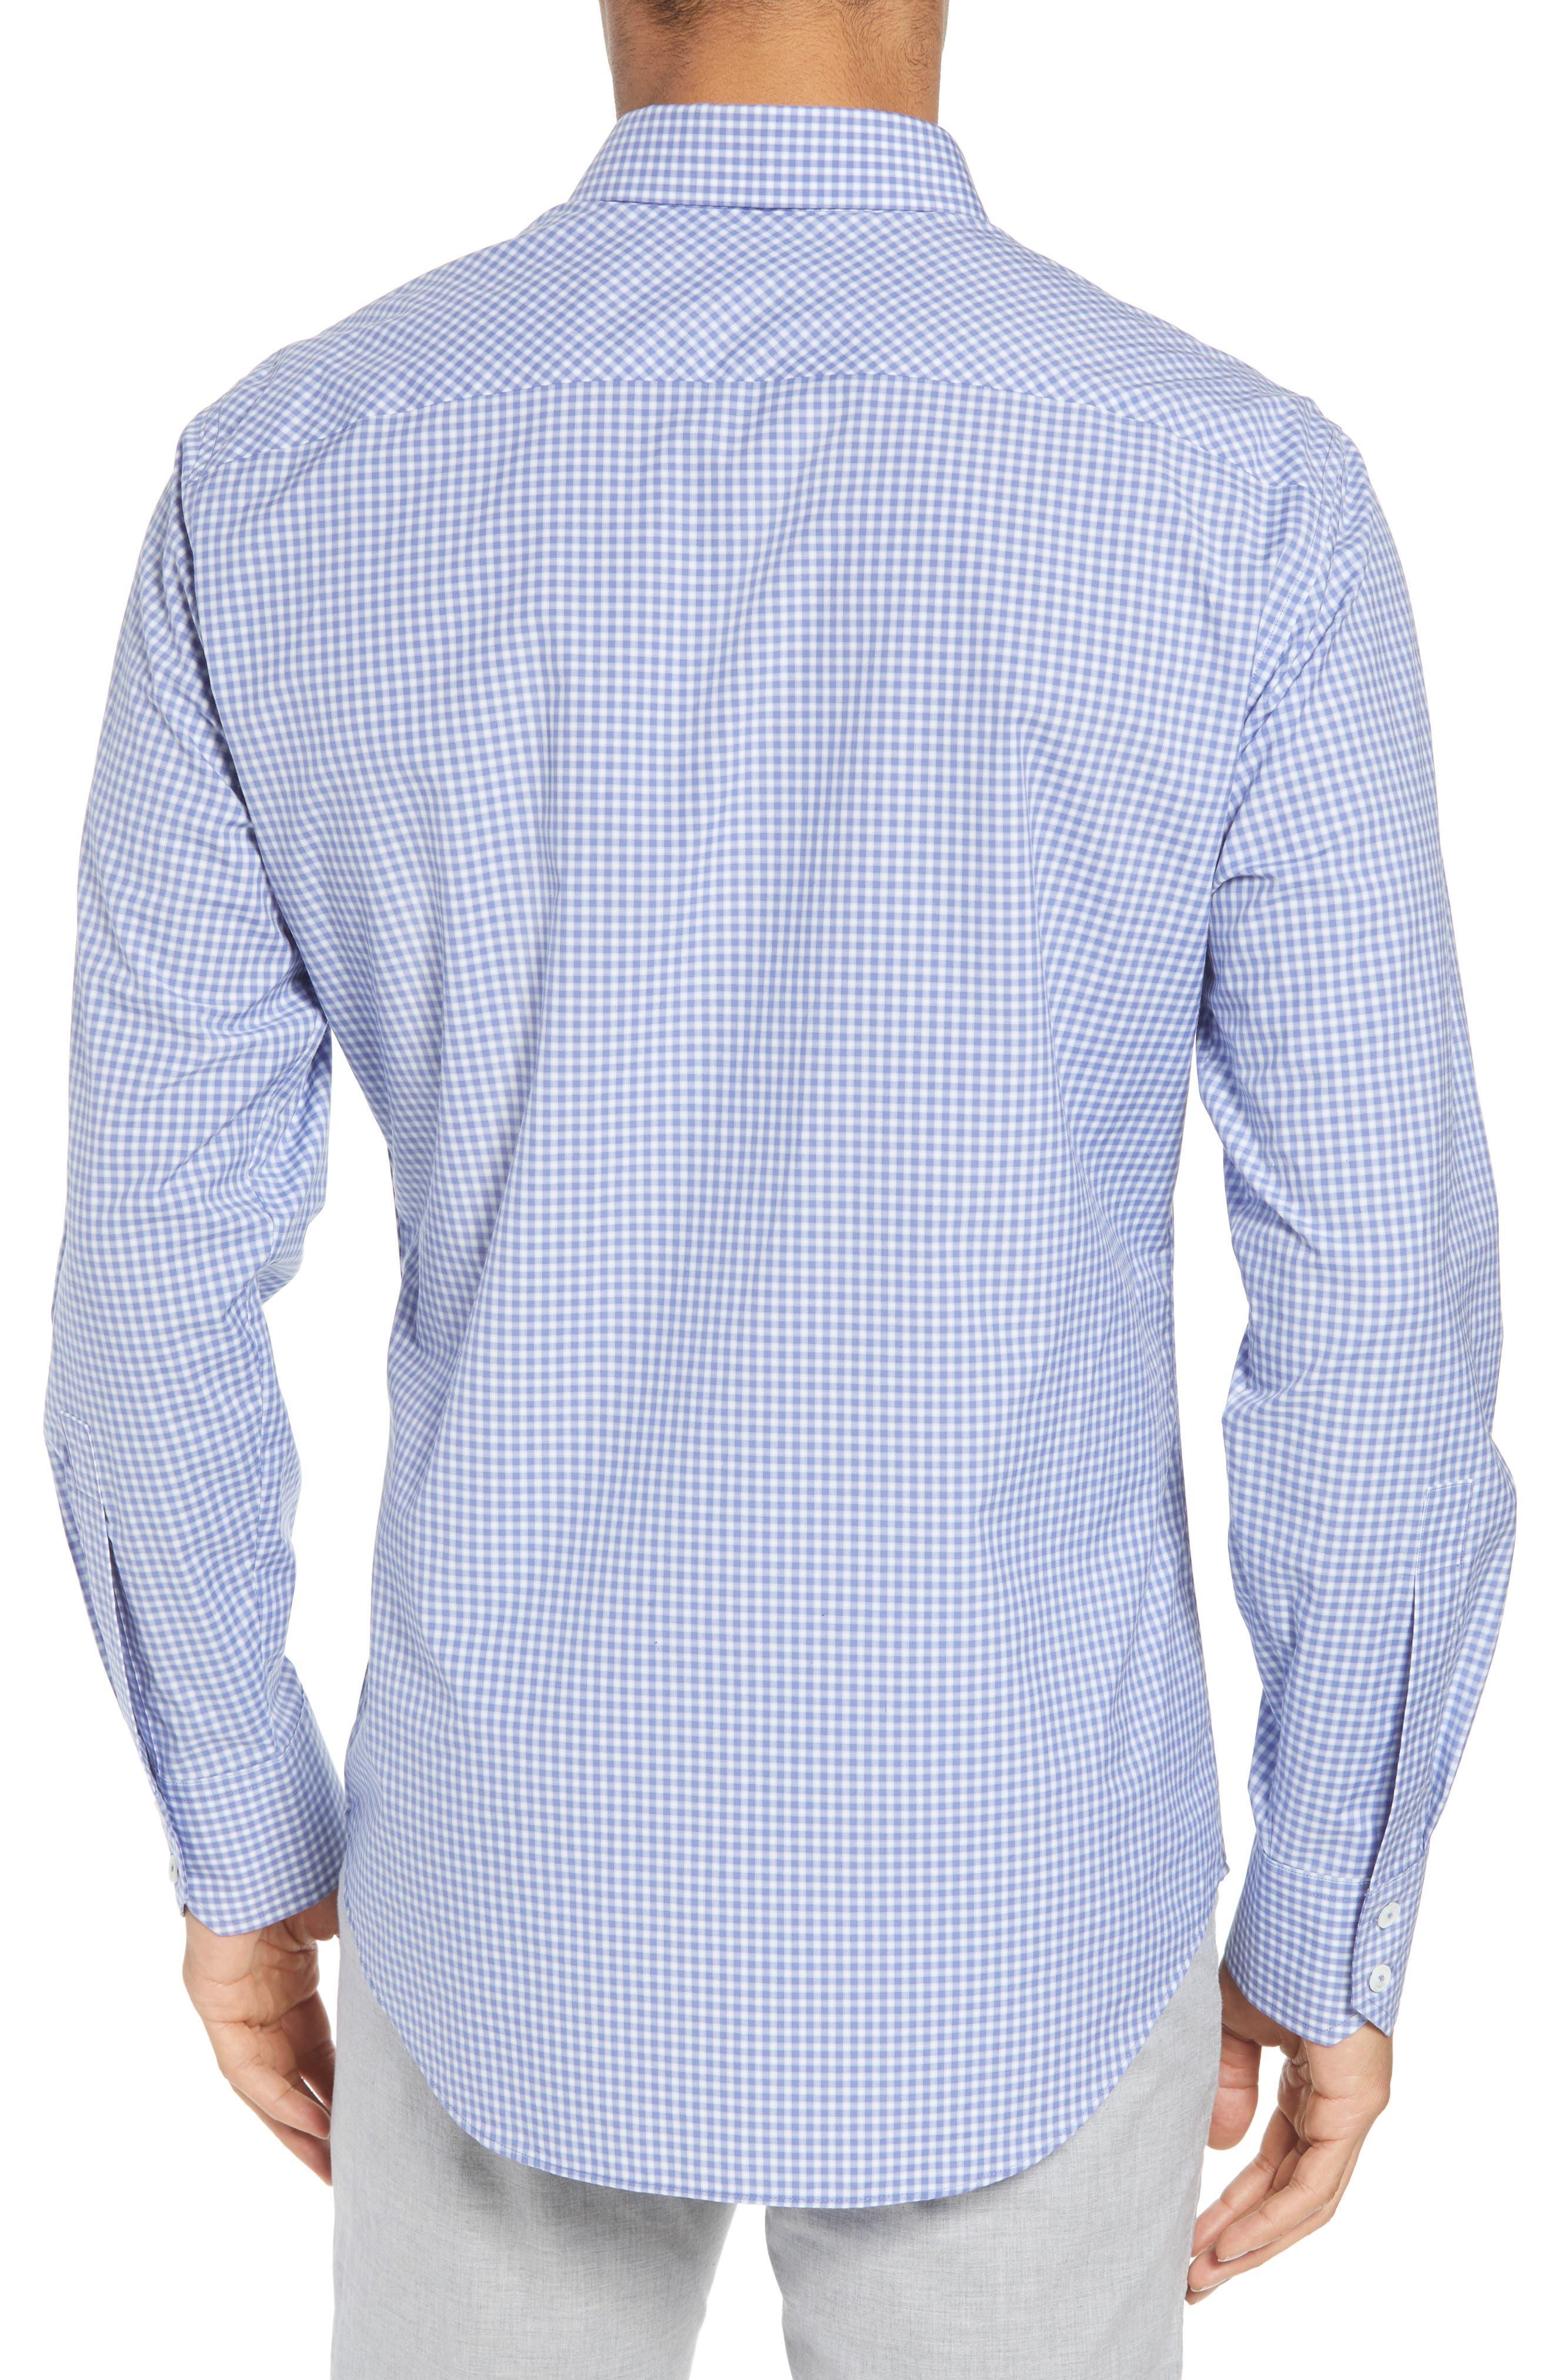 Winston Regular Fit Sport Shirt,                             Alternate thumbnail 2, color,                             Ocean